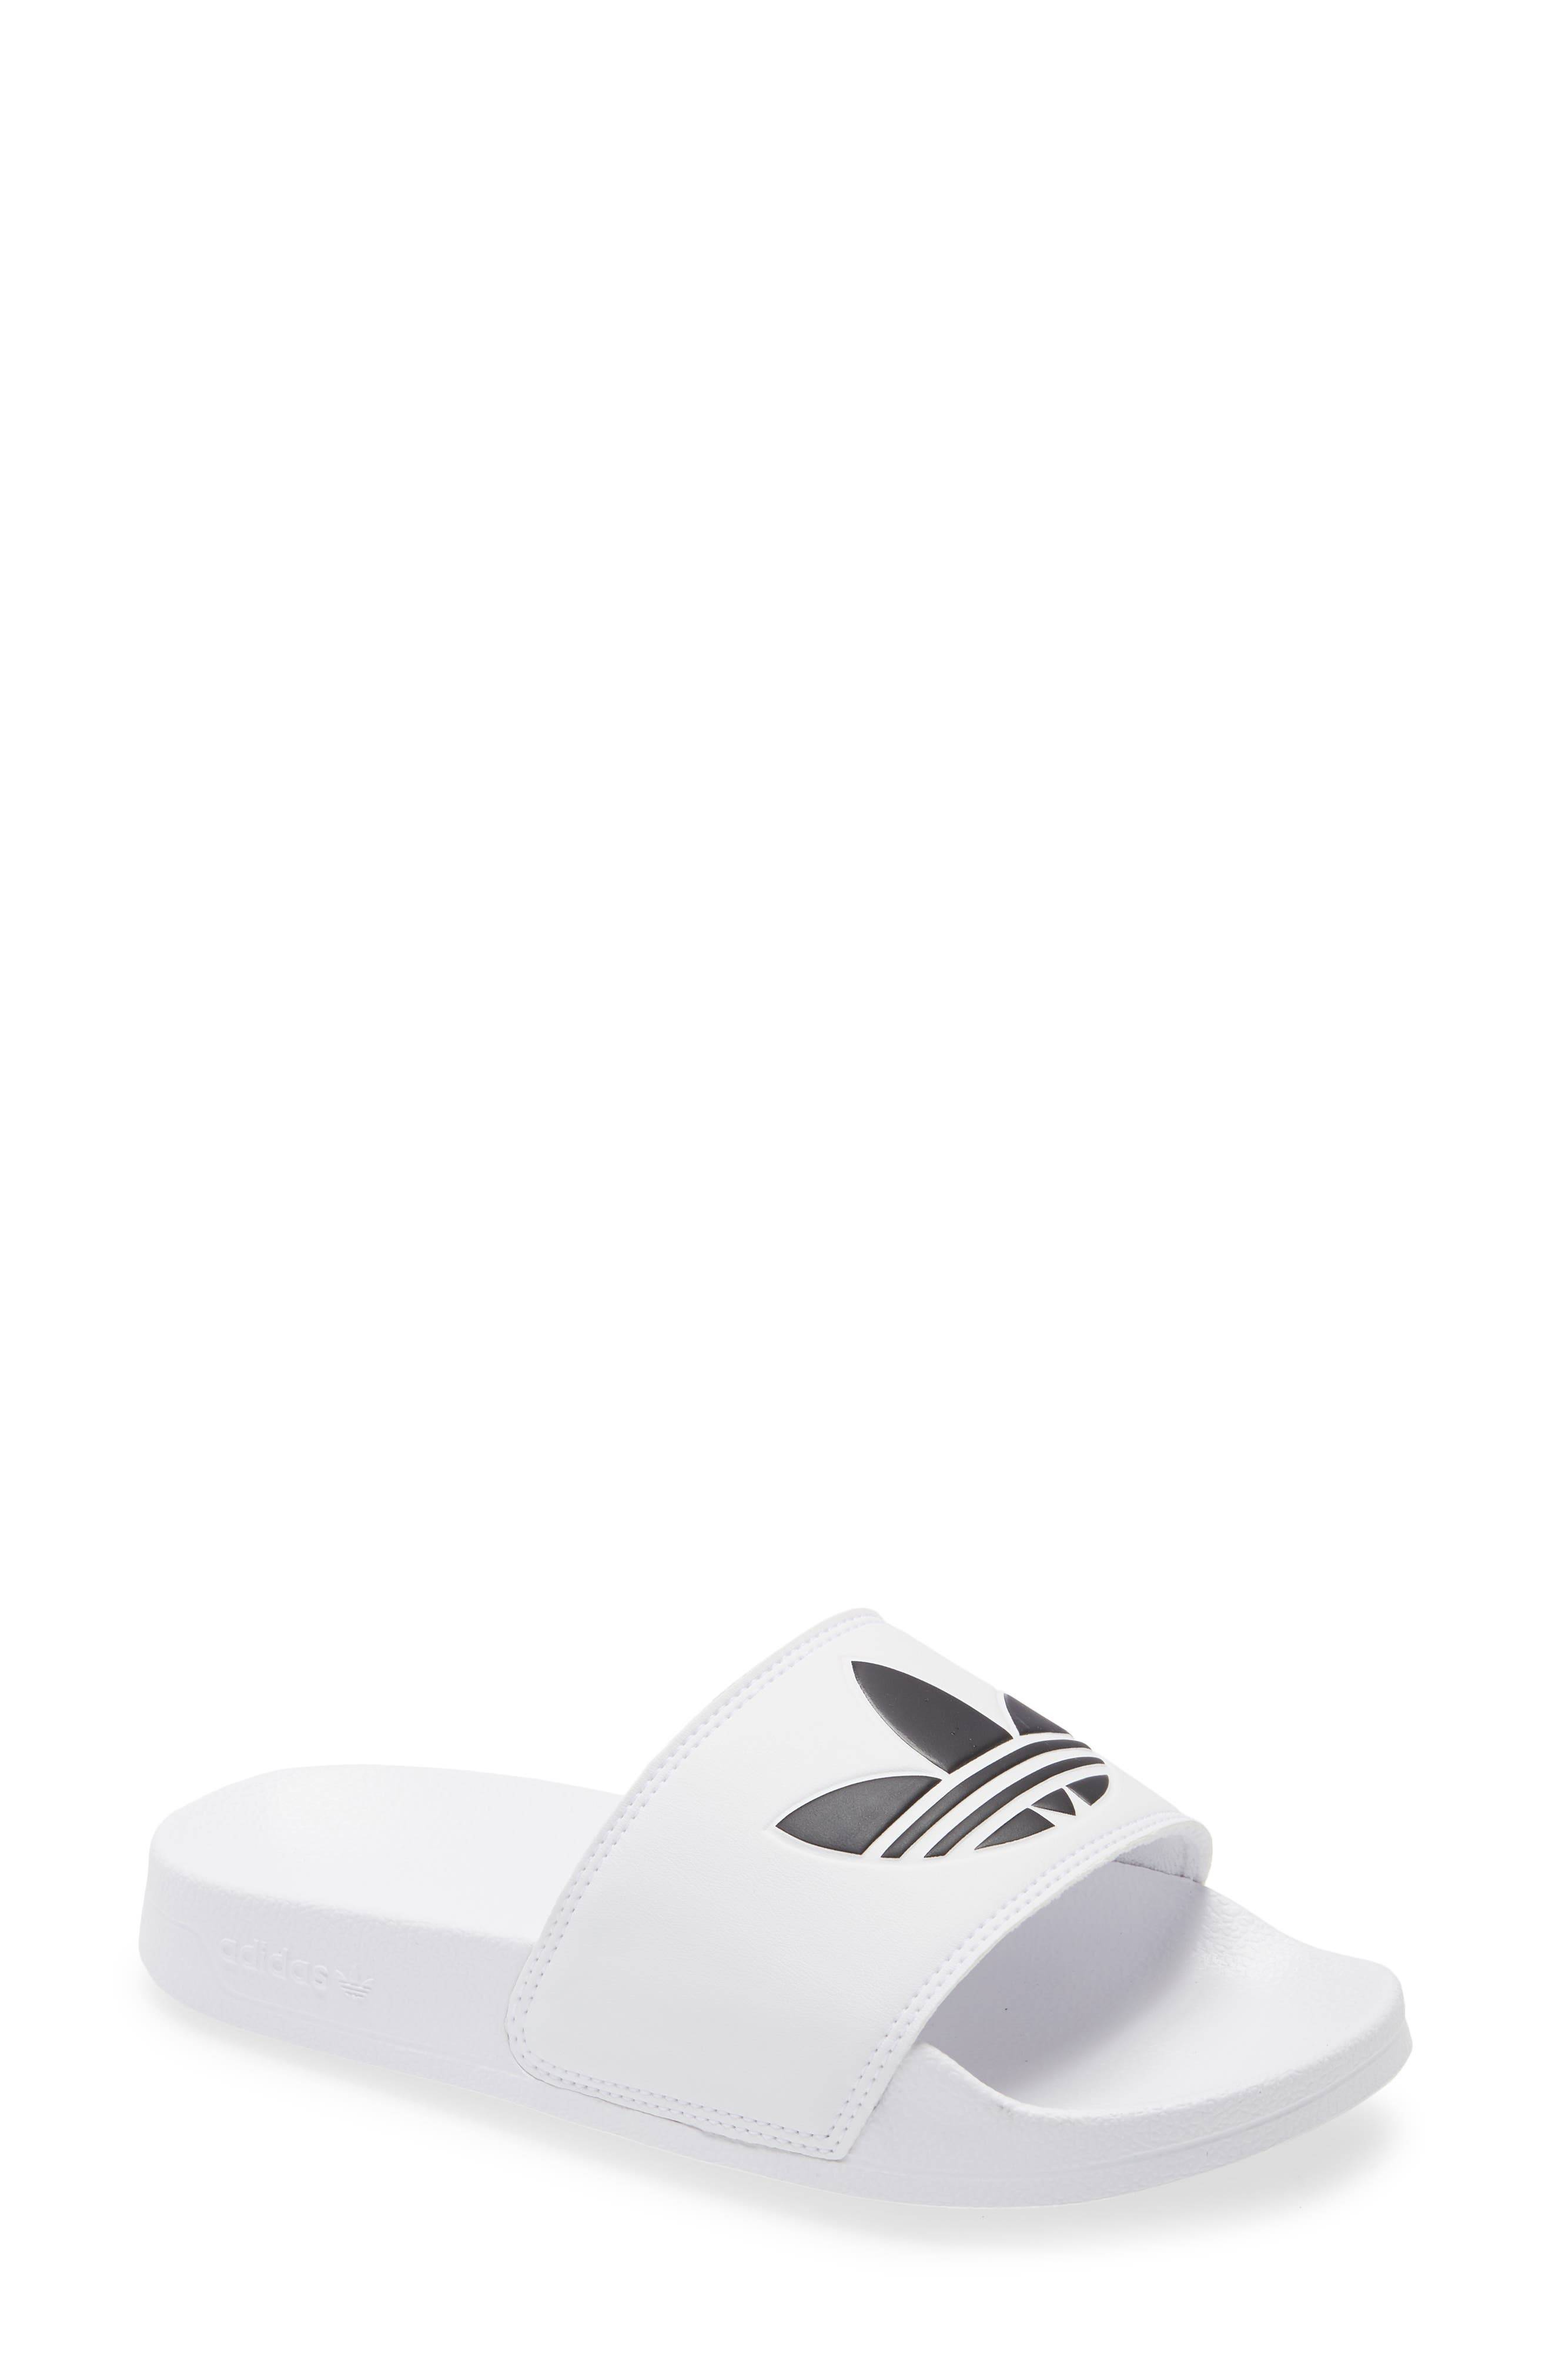 adidas Kid's Adidas Adilette Lite Sport Slide, Size 5 M - White